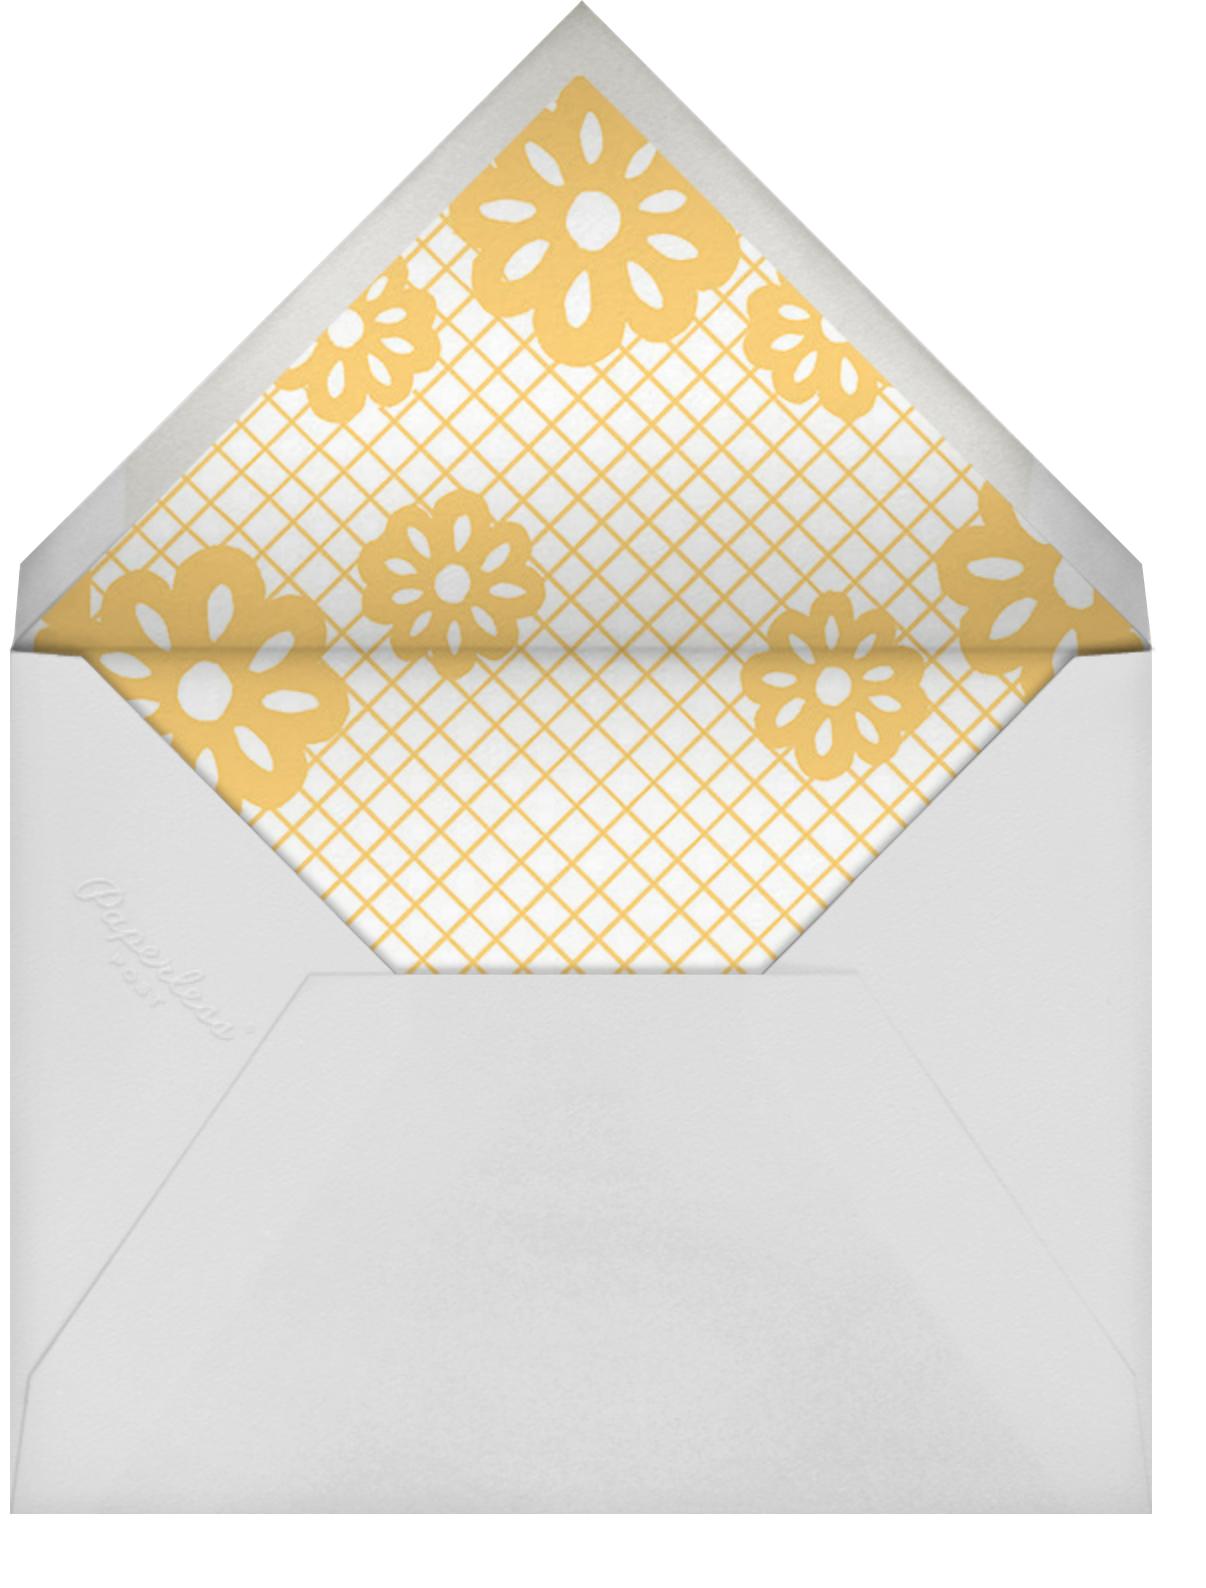 Papel Picado Celebration - Paperless Post - Envelope